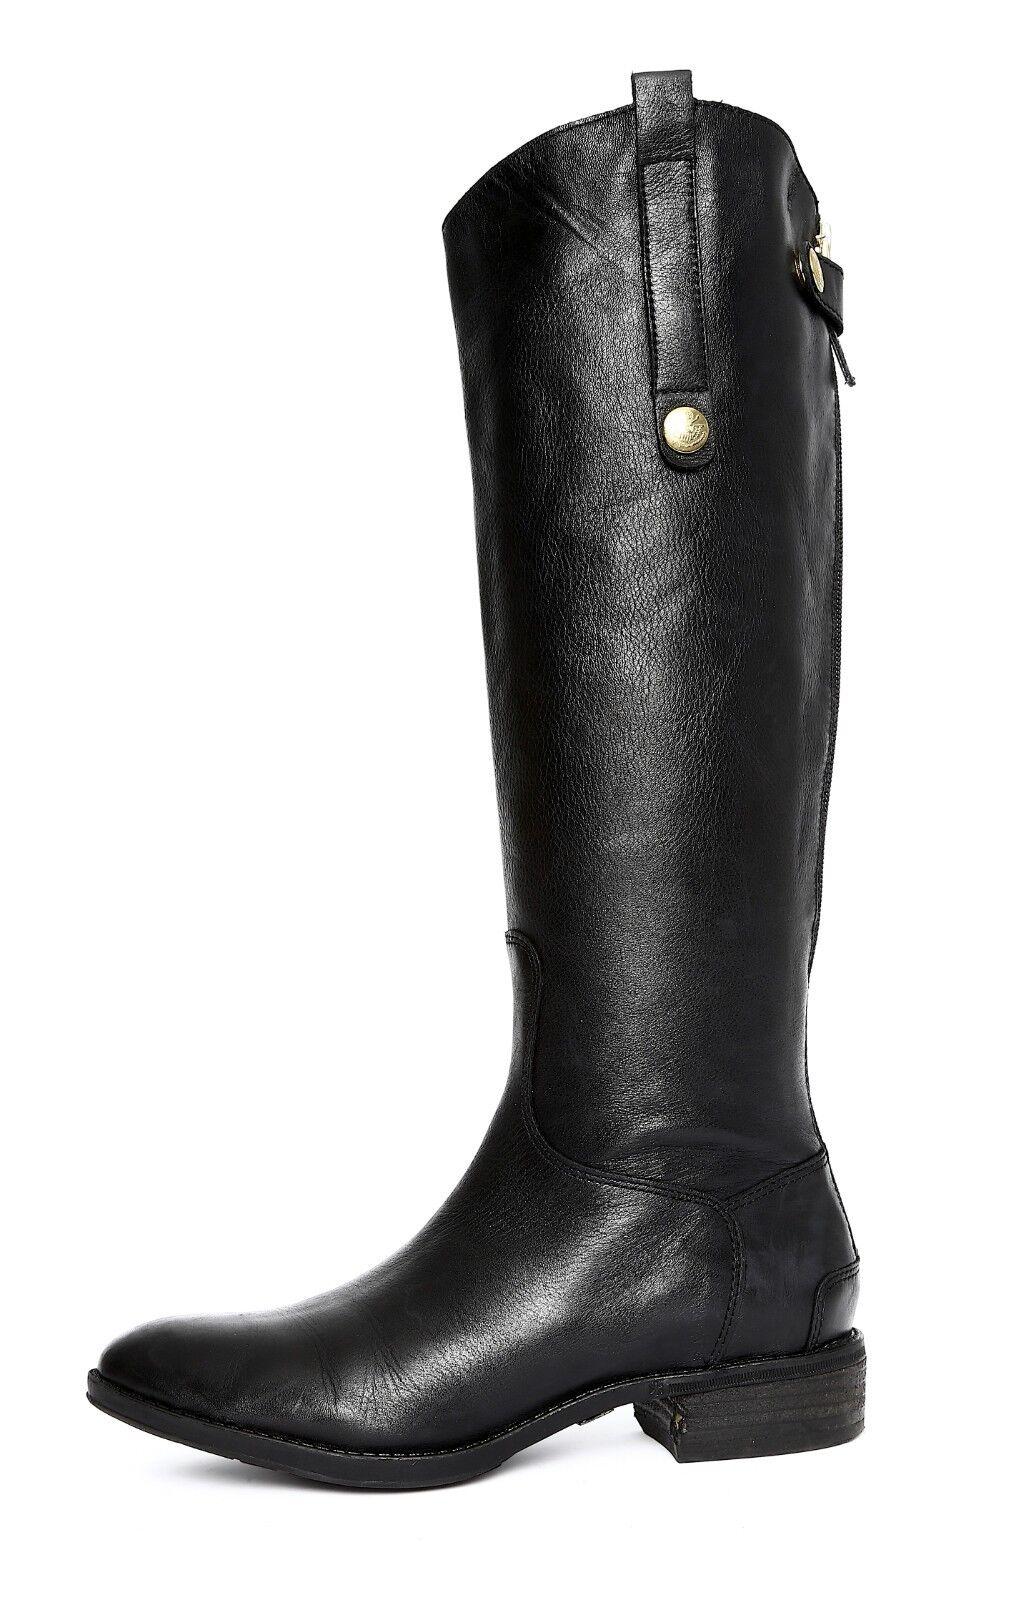 Sam Edelman Penny Womens Black Boot Sz 6.5 3382